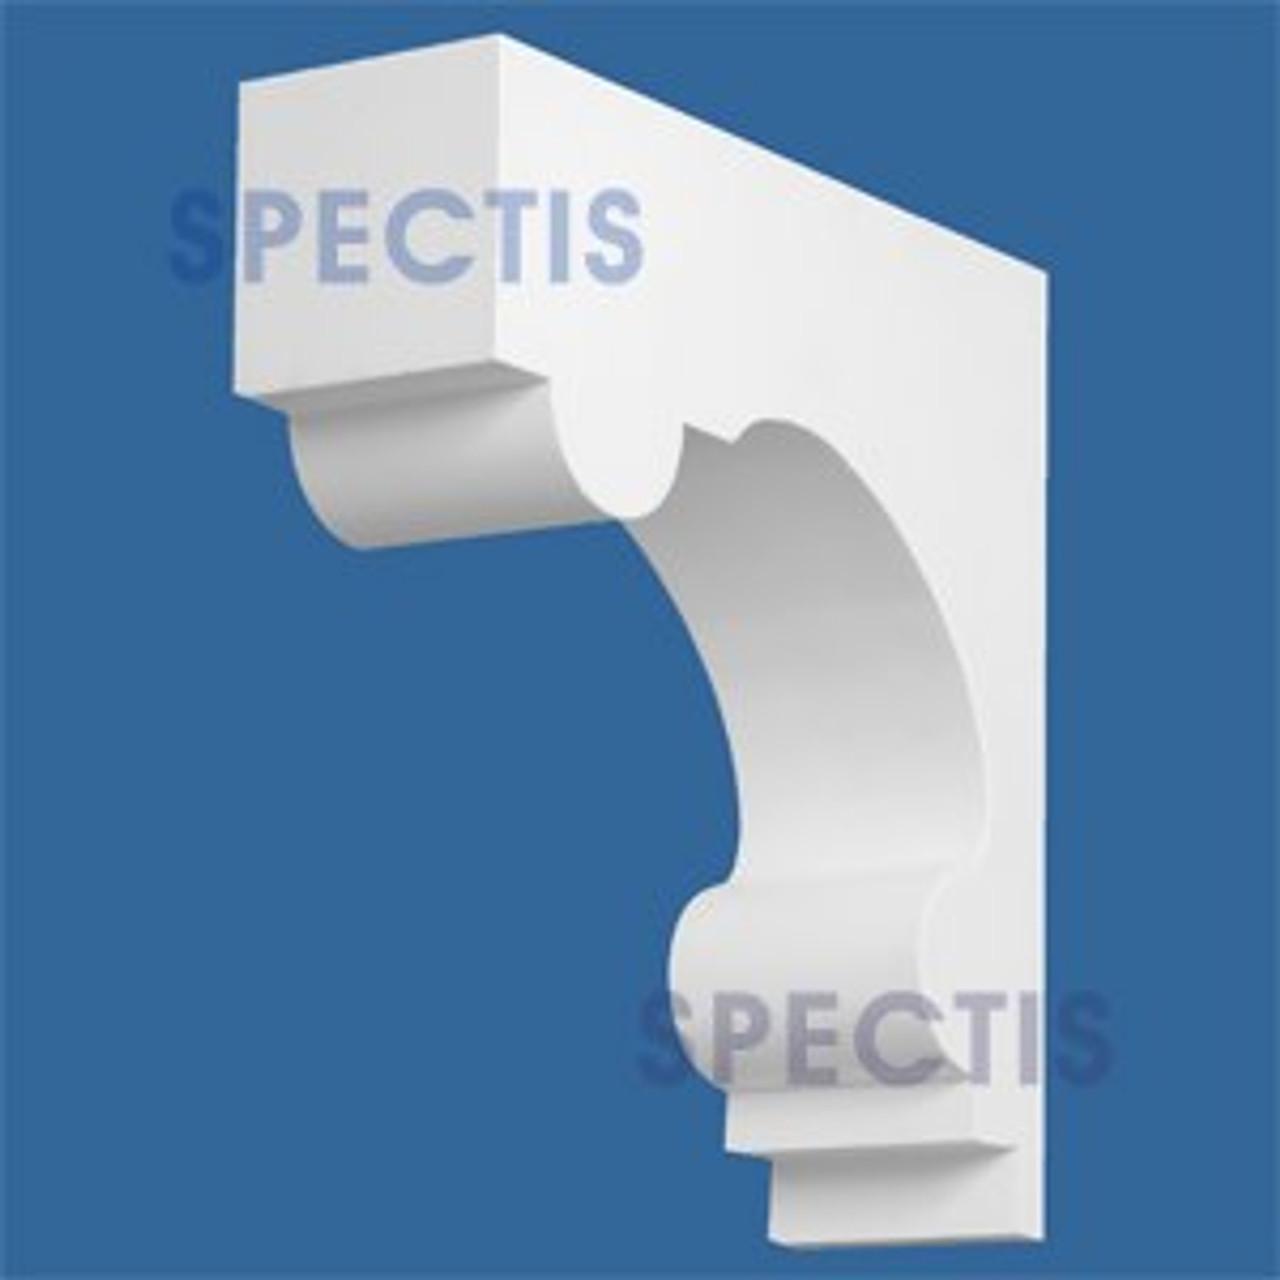 "BL2787 Corbel Block or Eave Bracket 3.5""W x 11.75""H x 11.5"" P"